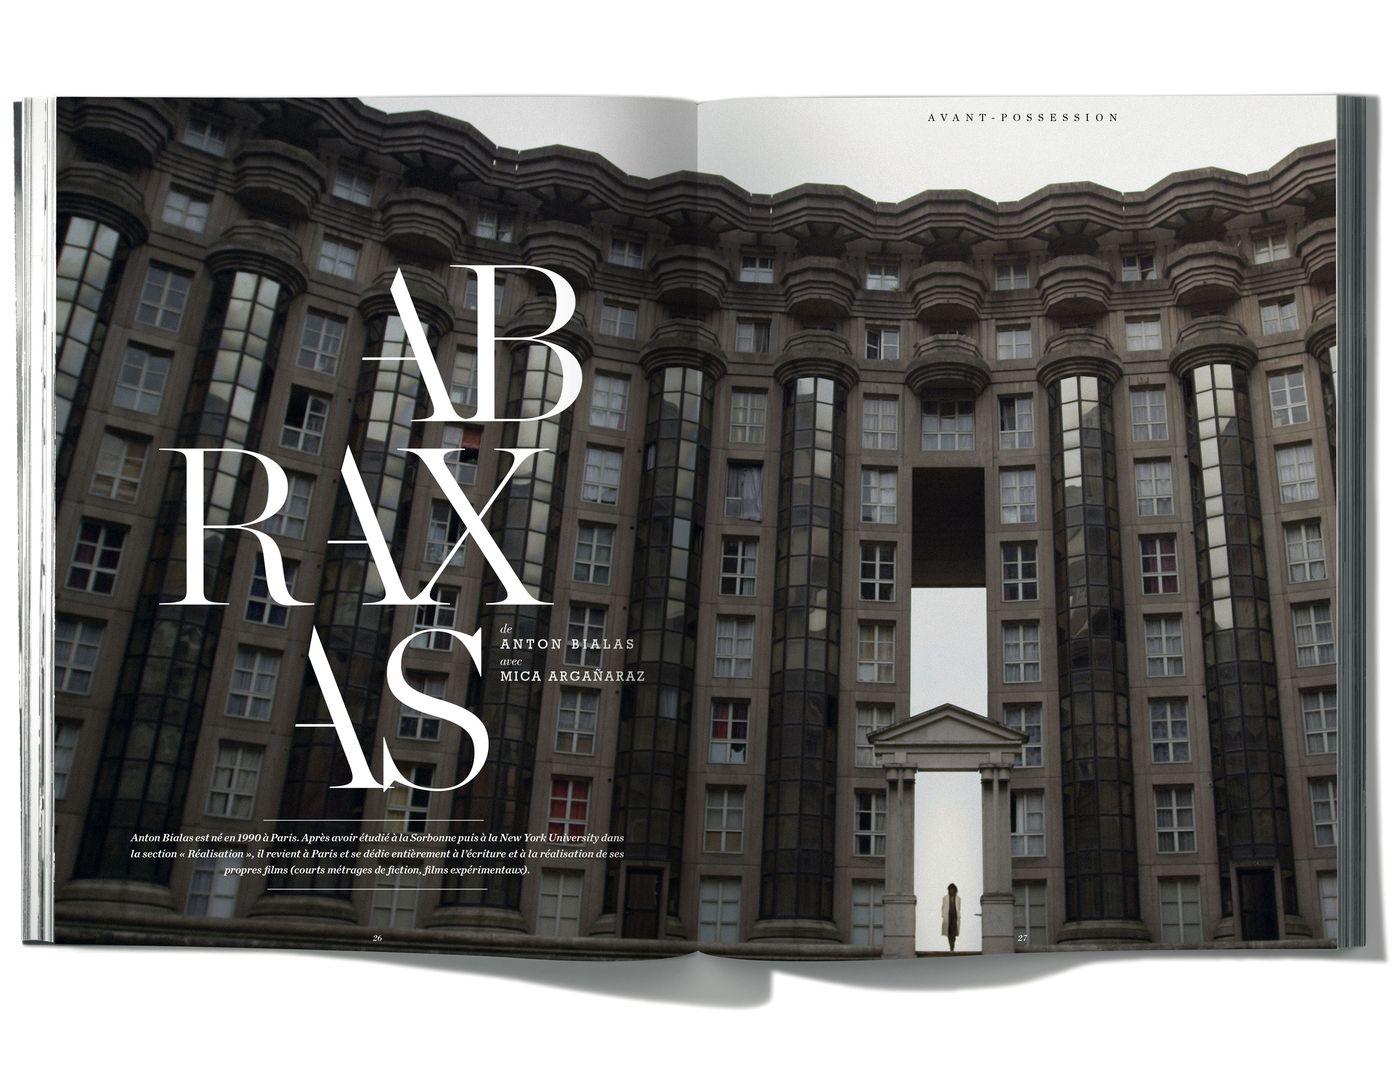 Photographies de Anton Bialas, Abraxas